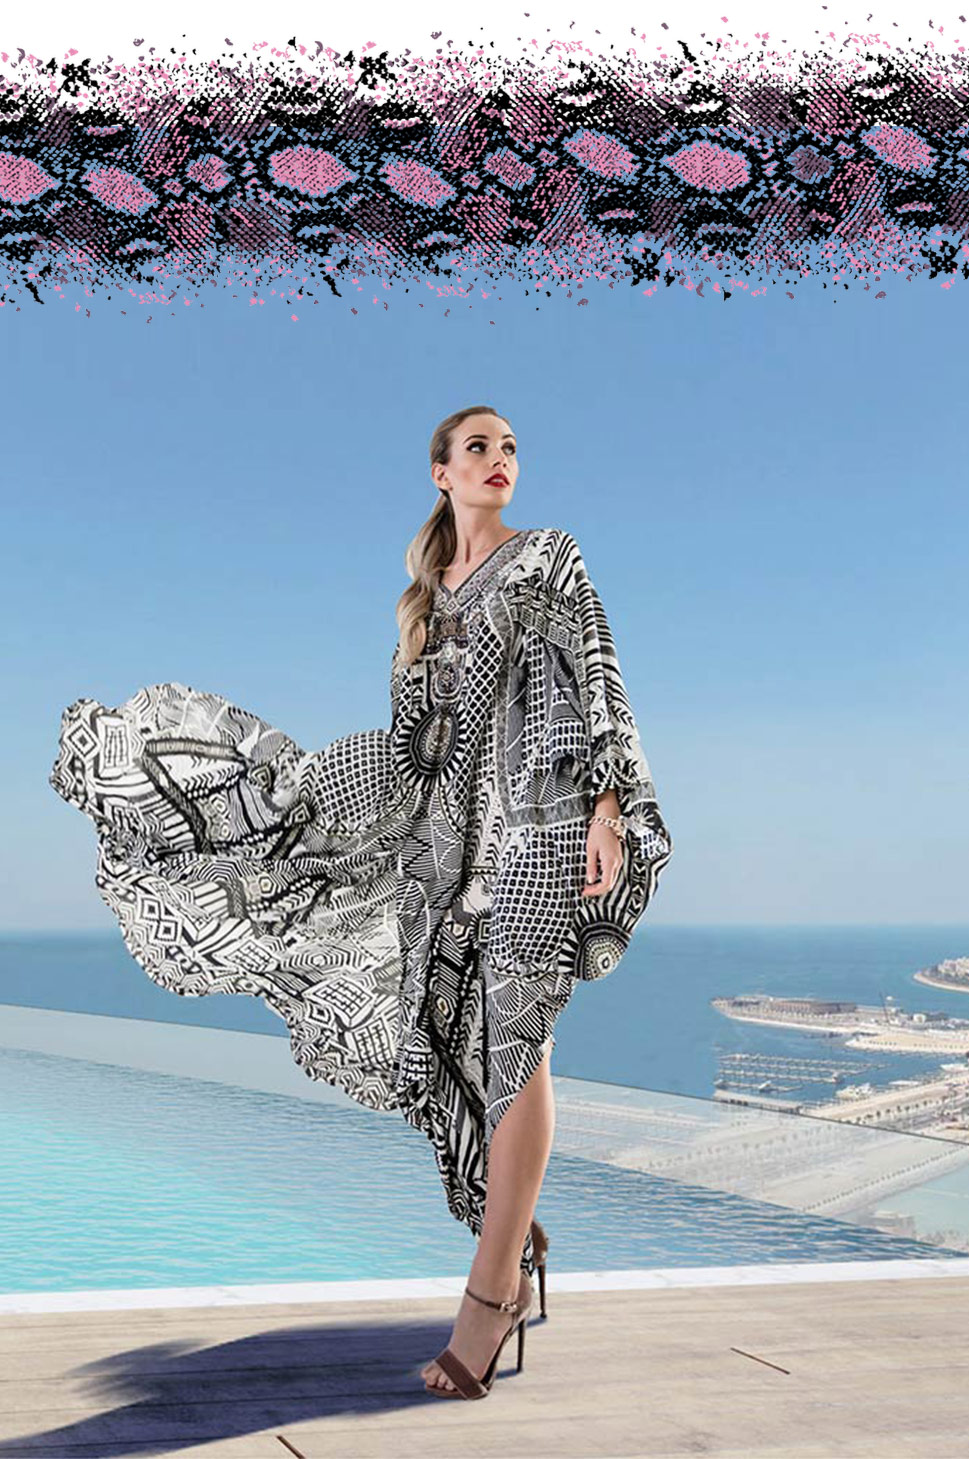 DAMAC Cavalli Tower Dubai Marina – Апартаменты класса люкс в Дубае